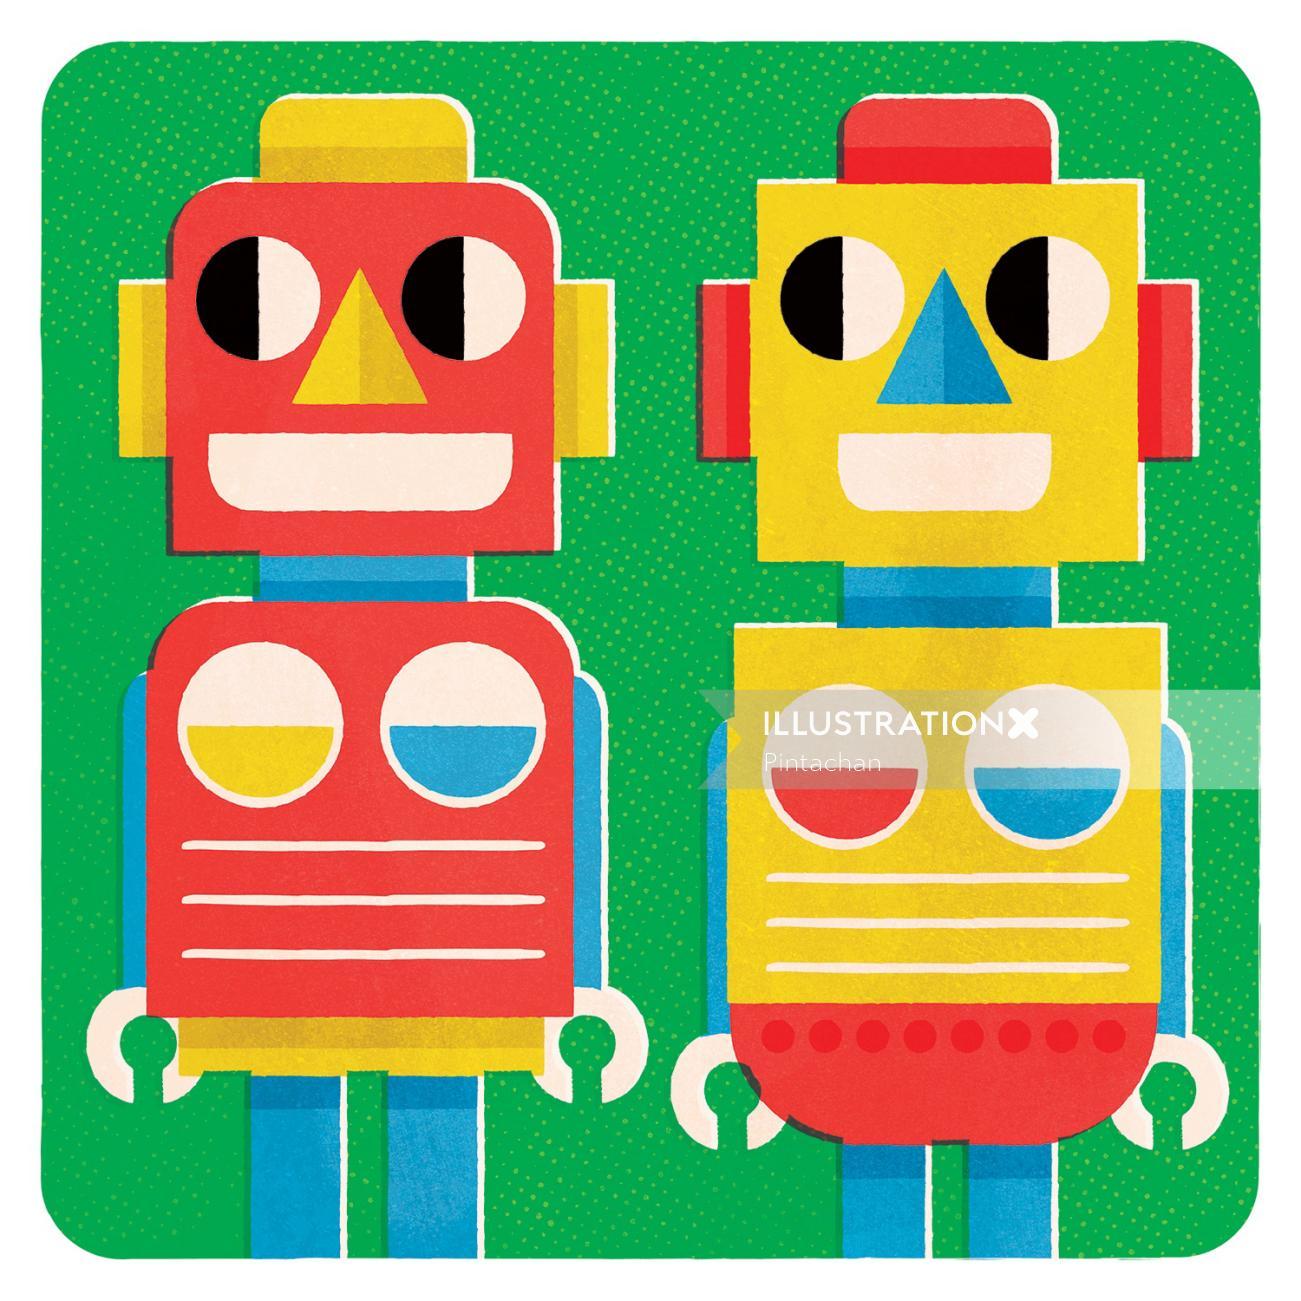 Pop art of two Robots